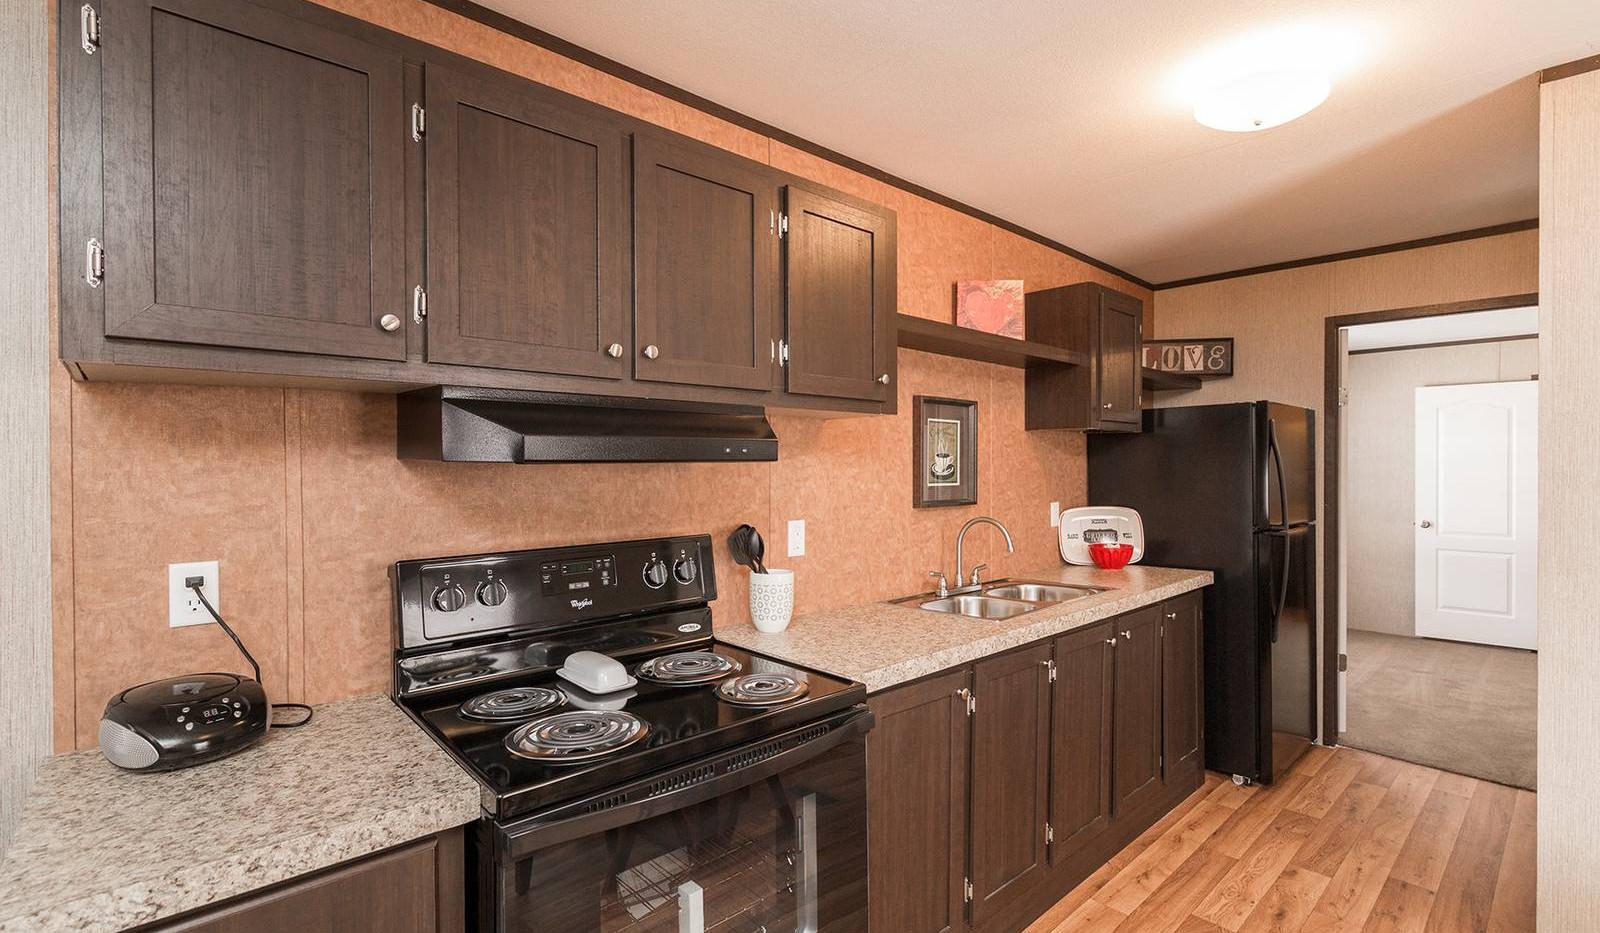 3-redman-1466a-kitchen-1-1600x1067.jpg